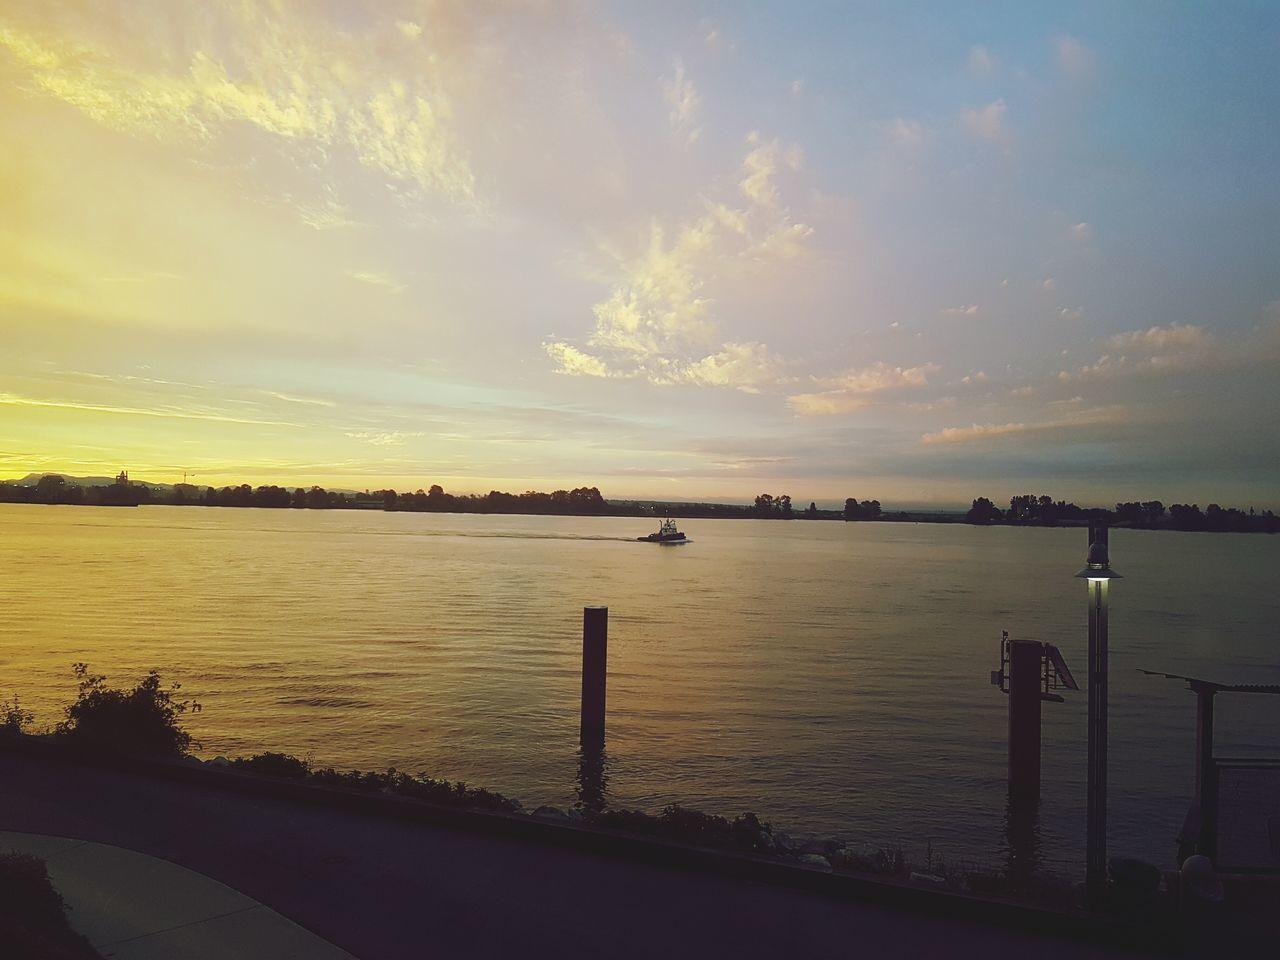 43 Golden Moments golden water&sky Boat Water Sky Night